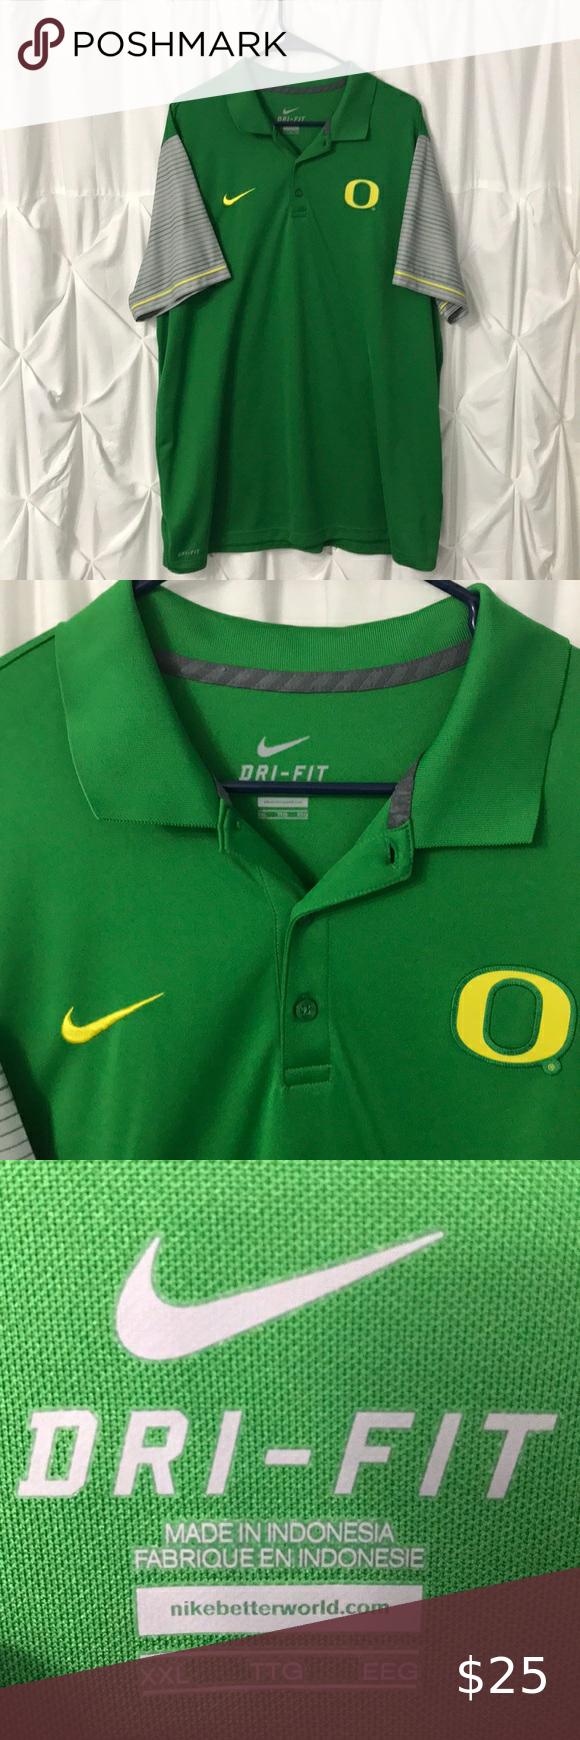 Nike Dri Fit Golf Polo Oregon Ducks Green Gray Euc Unique Shirt Golf Shirts Striped Sleeve [ 1740 x 580 Pixel ]